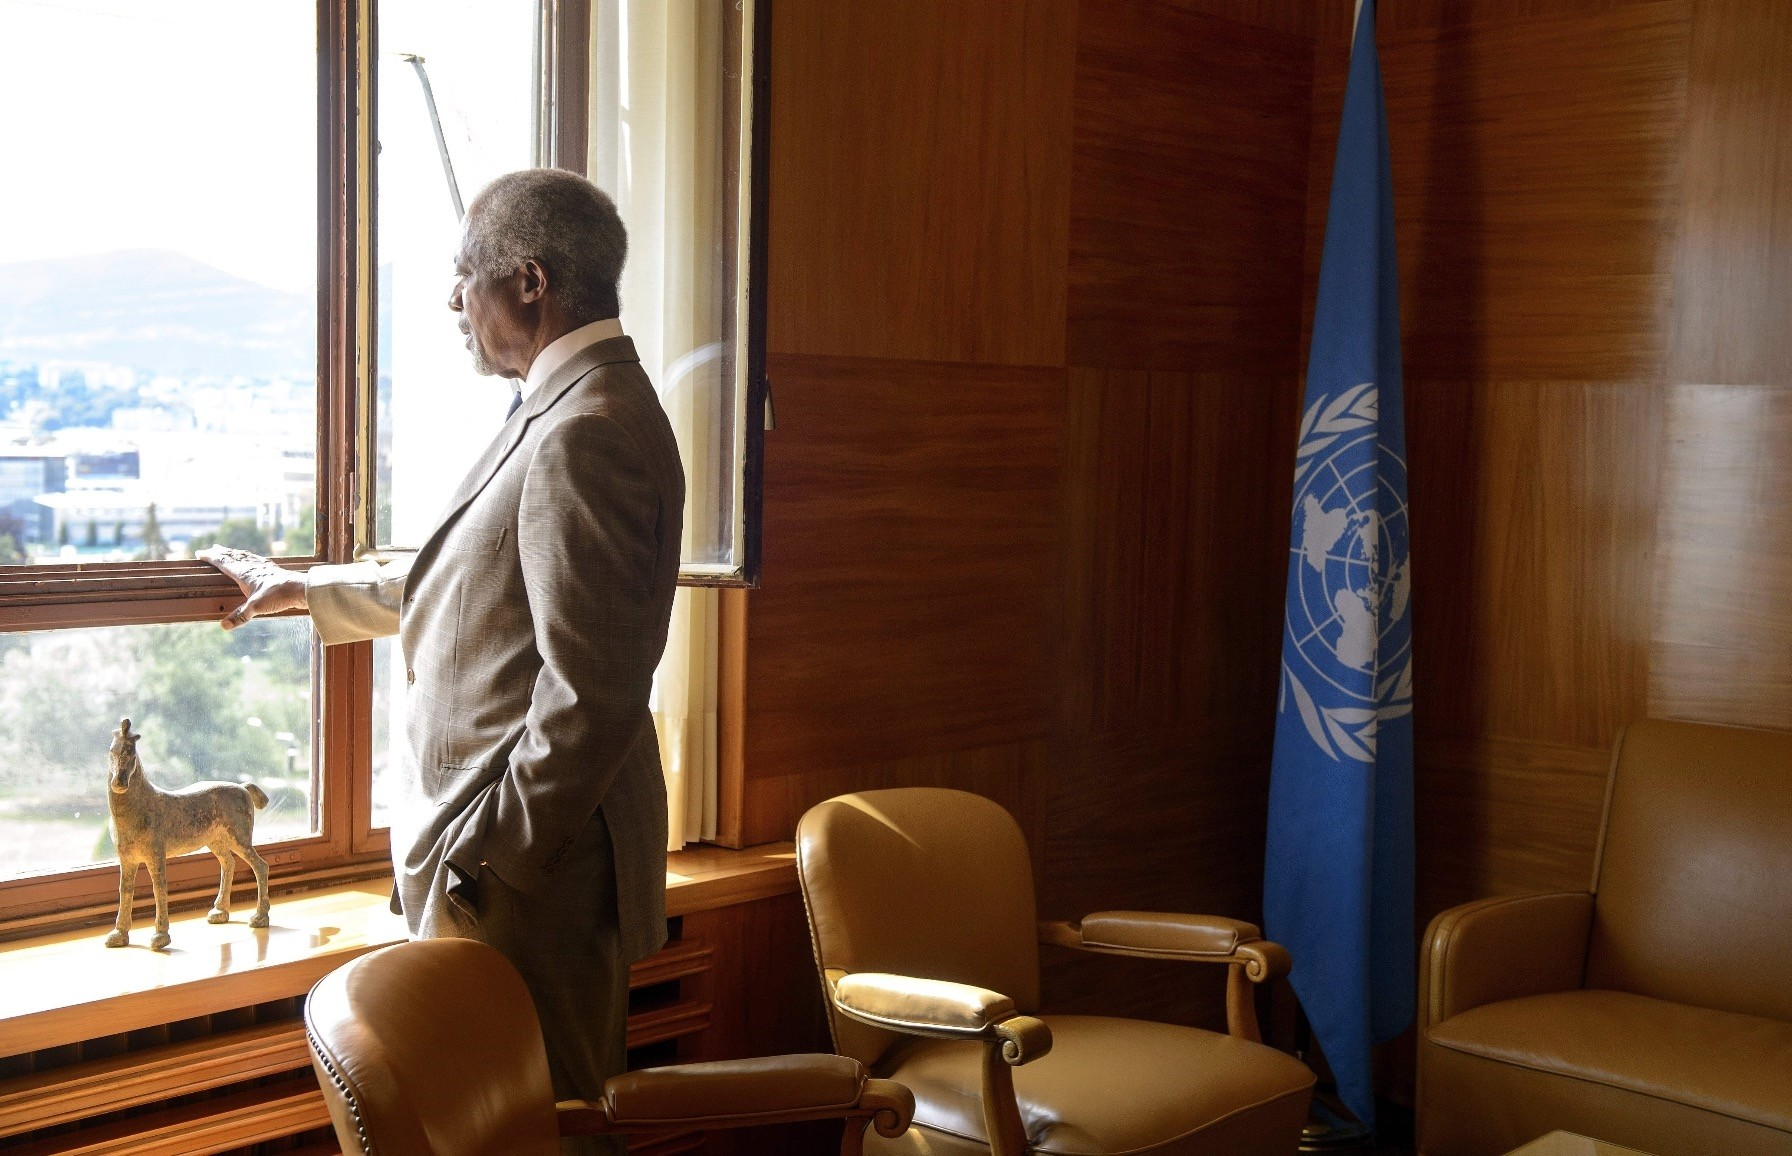 Late U.N. Secretary-General Kofi Annan gazes through a window before a meeting at his office in Geneva, July 20, 2012.